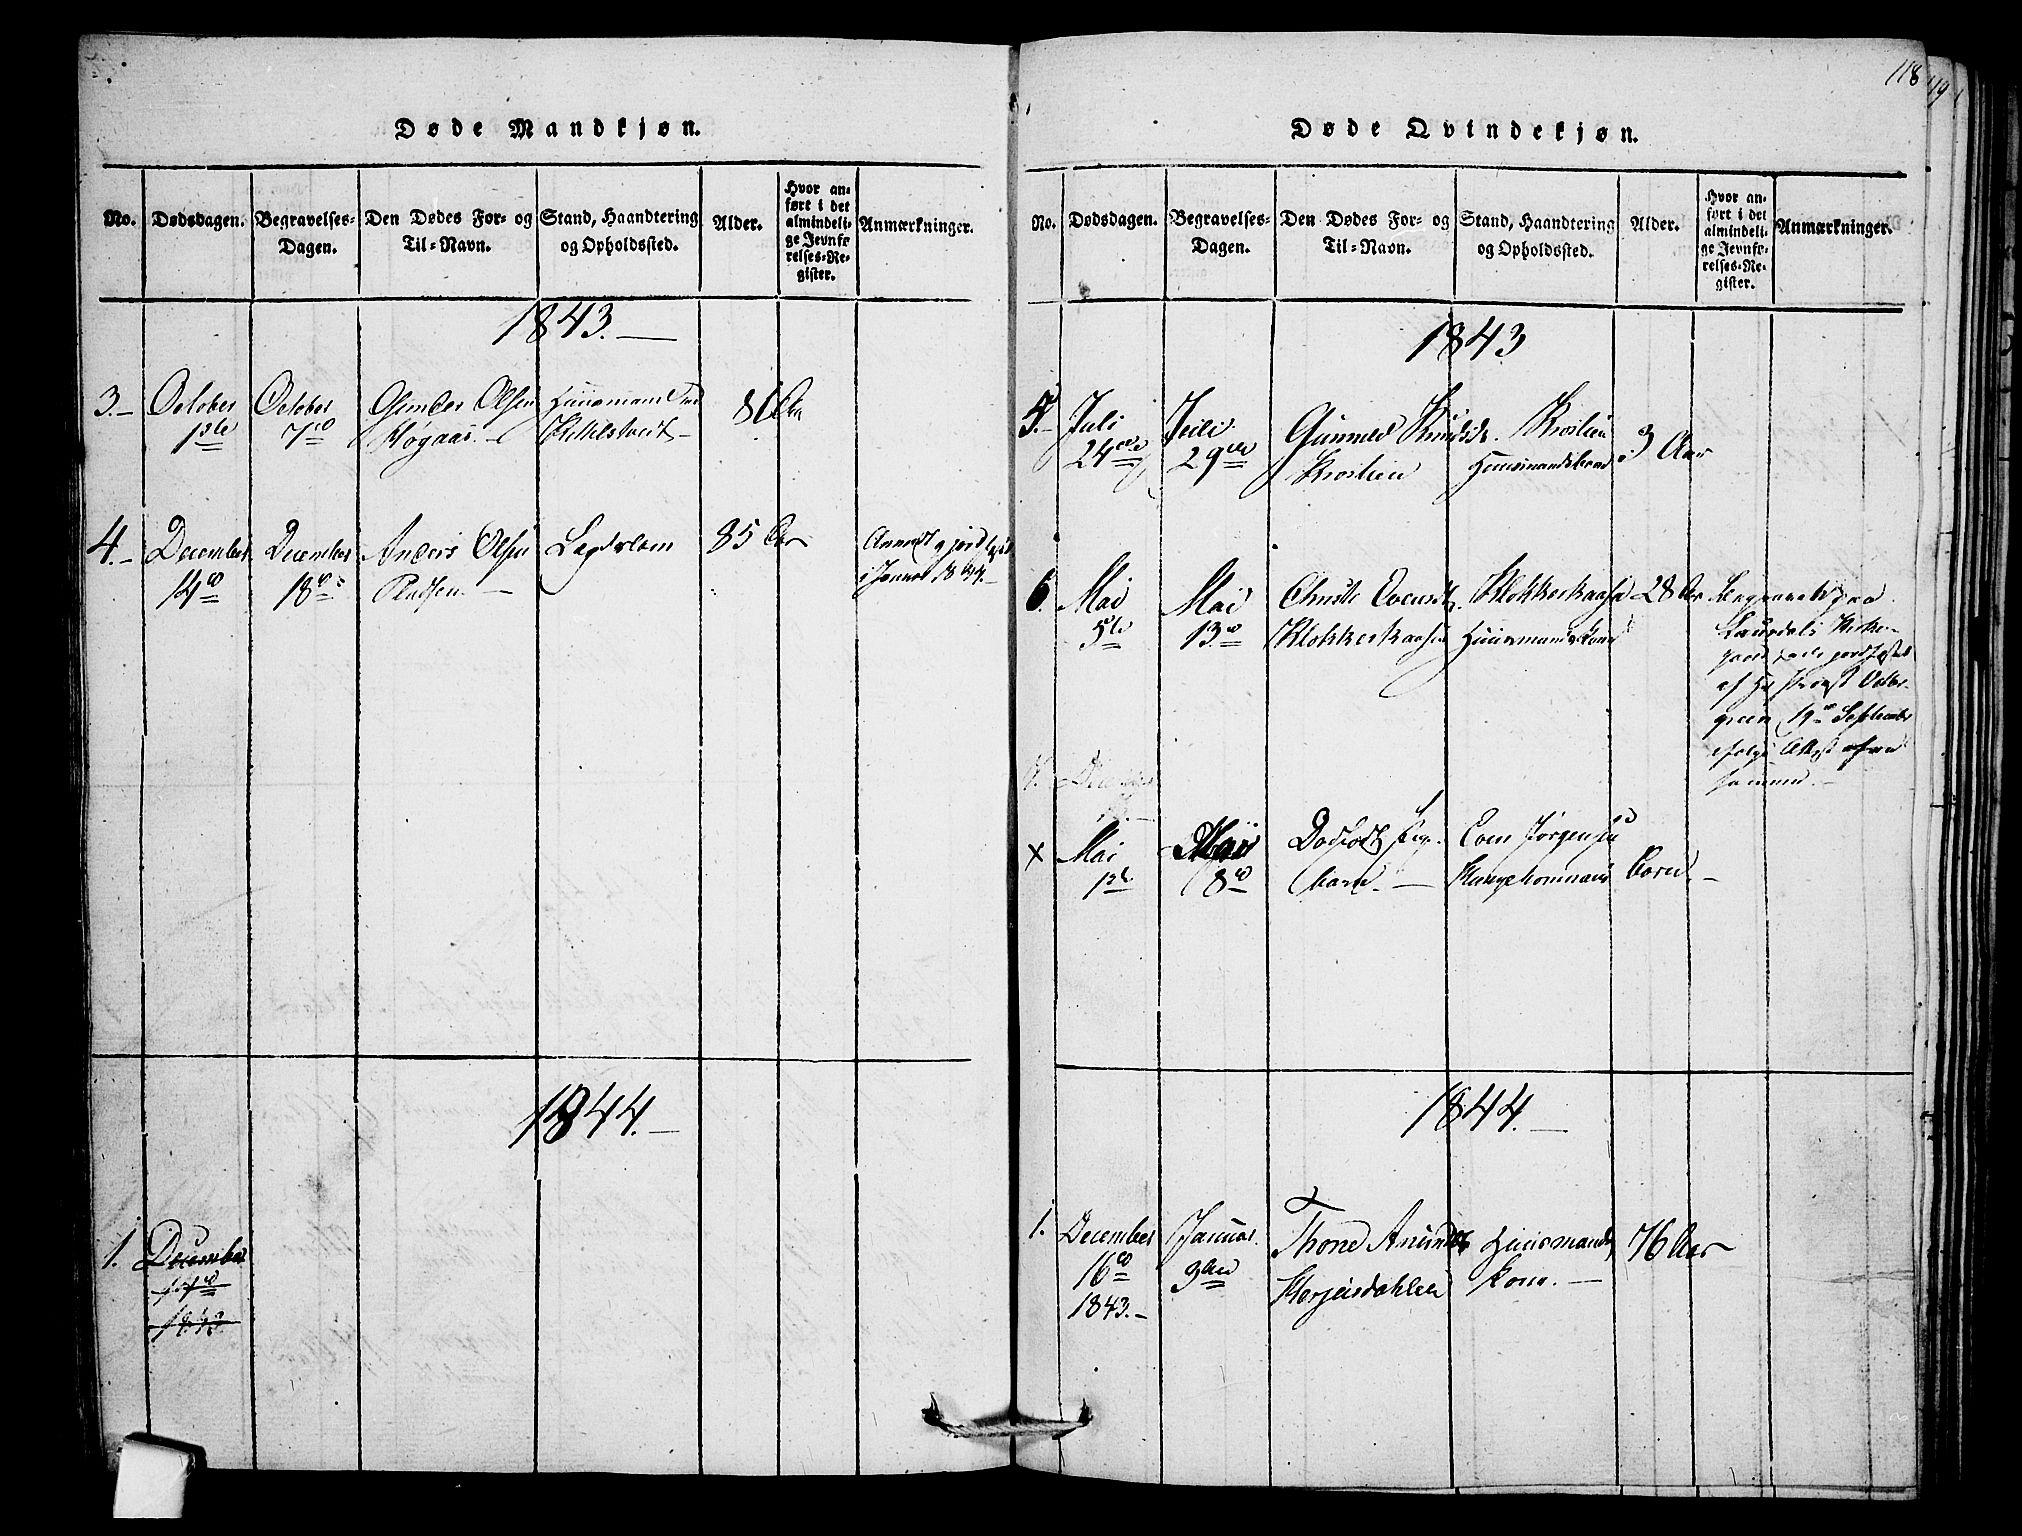 SAKO, Mo kirkebøker, F/Fb/L0001: Ministerialbok nr. II 1, 1814-1844, s. 118